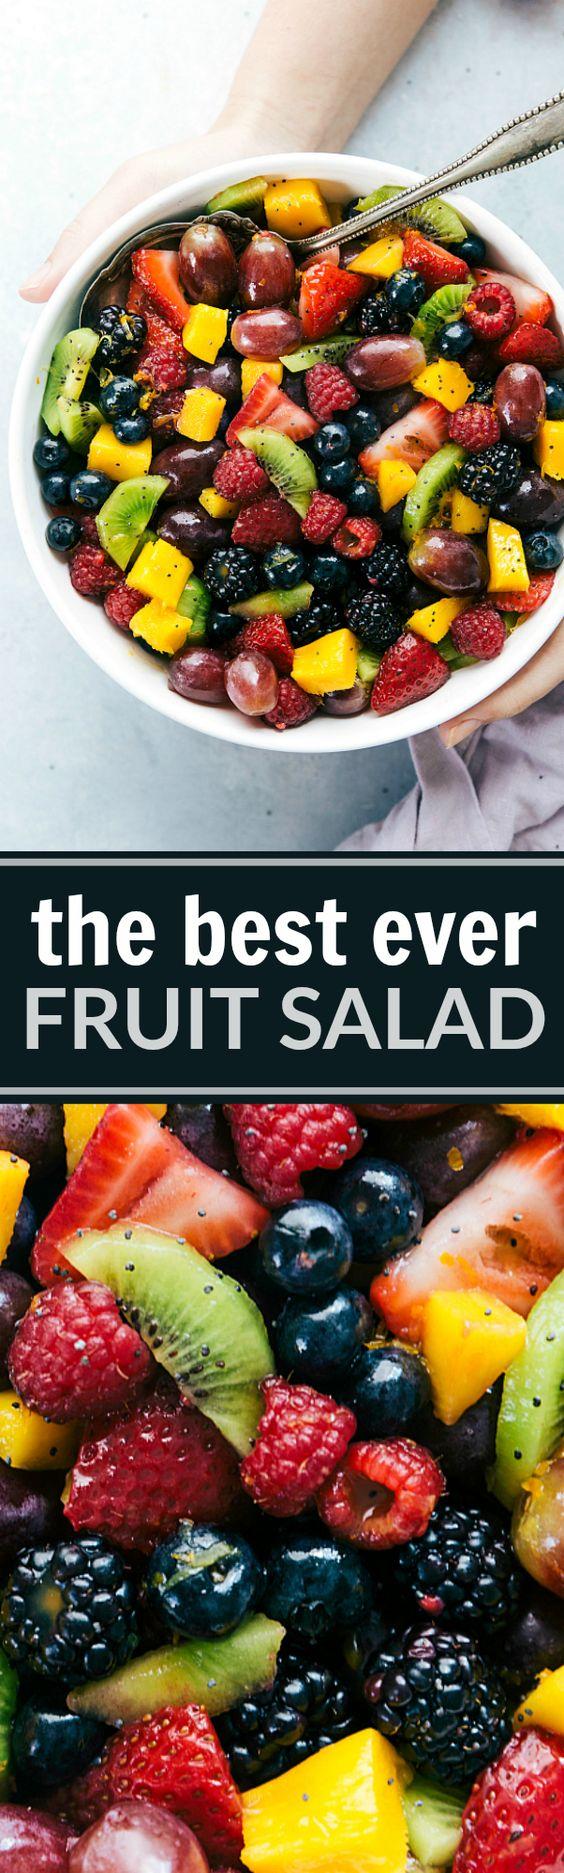 The Best Ever Fruit Salad.